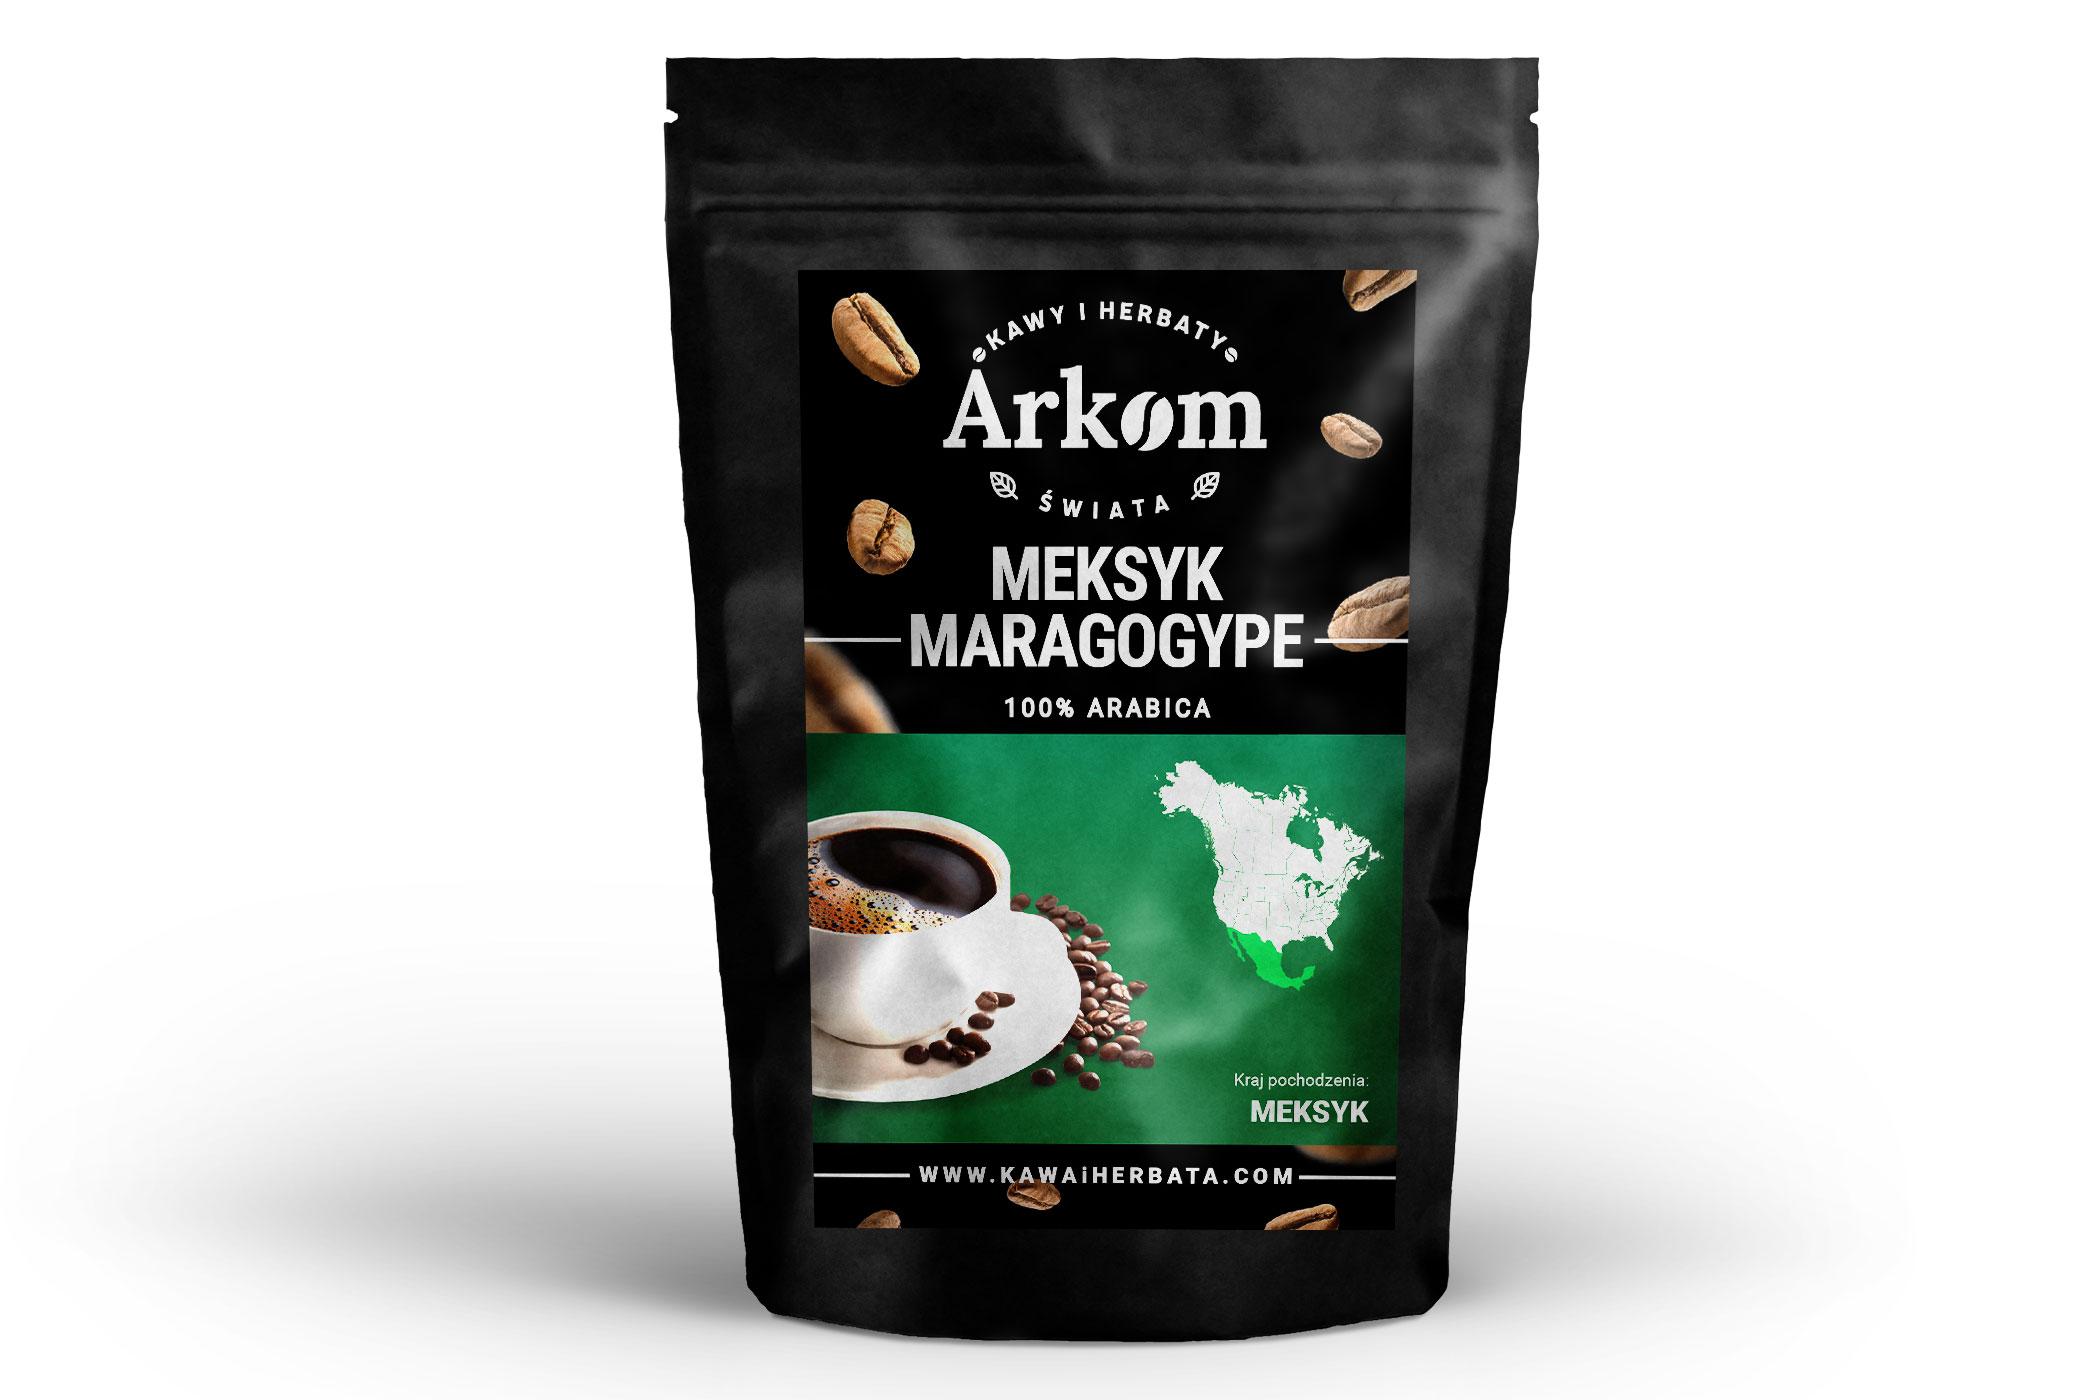 Kawa Arabica Meksyk Maragogype 1kg 7109130380 Allegro Pl